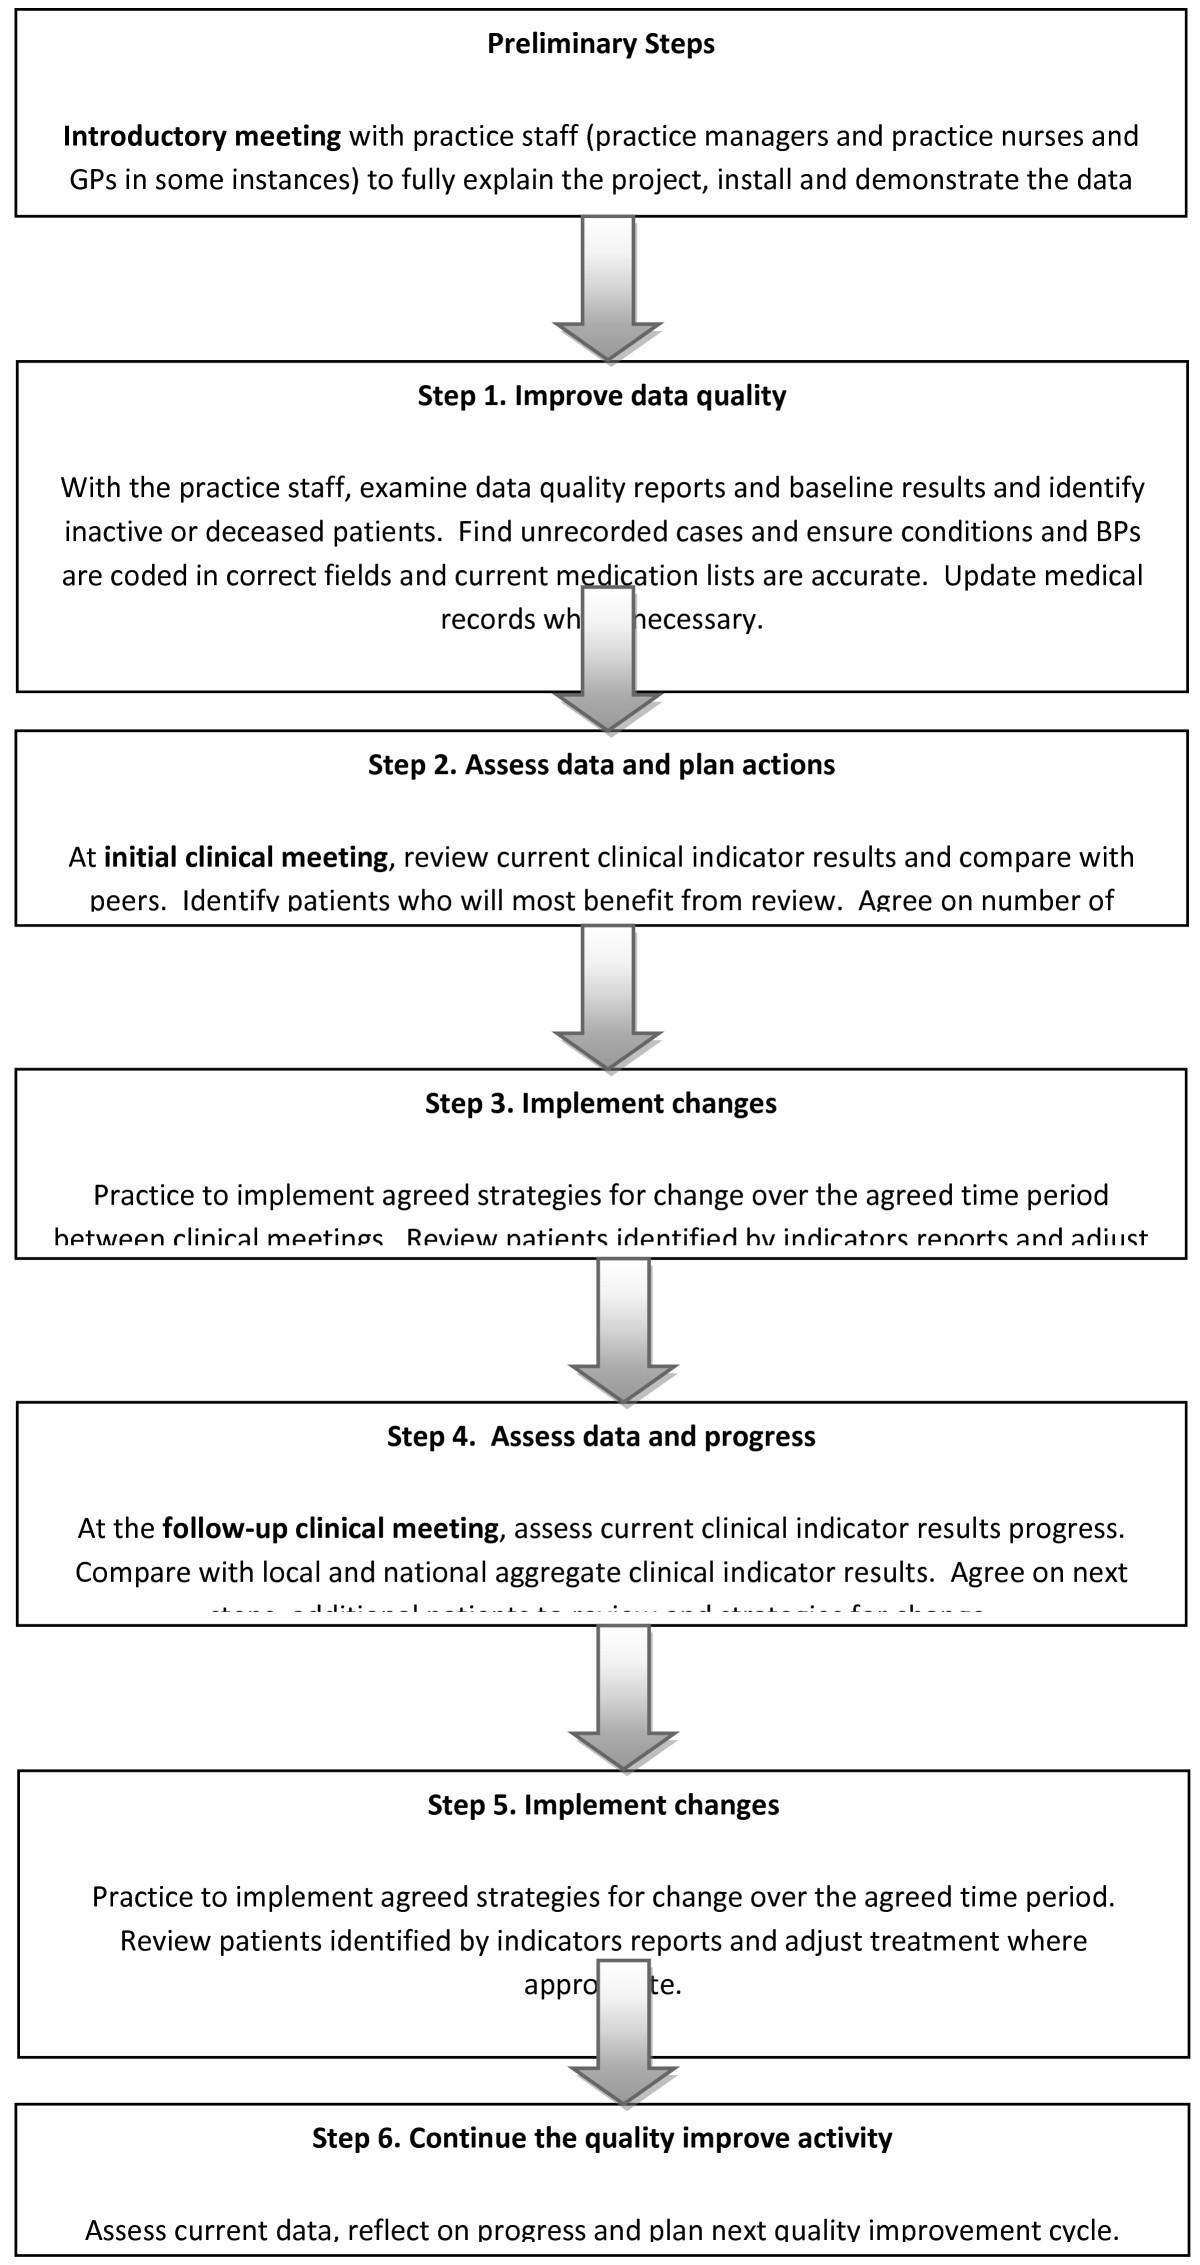 Prescribing Data in General Practice Demonstration (PDGPD) project ...